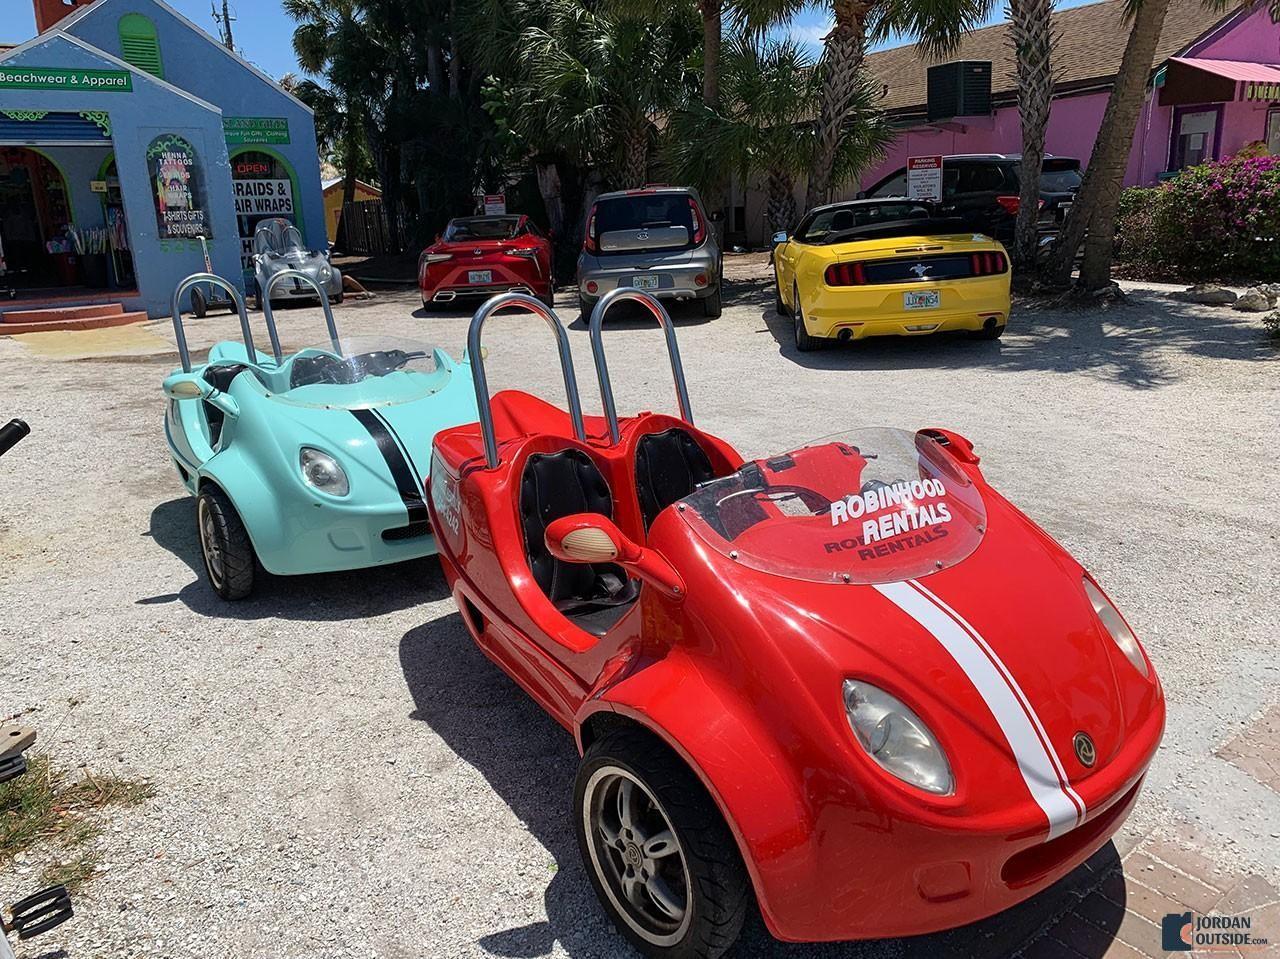 Robinhood Rentals, Siesta Key Florida